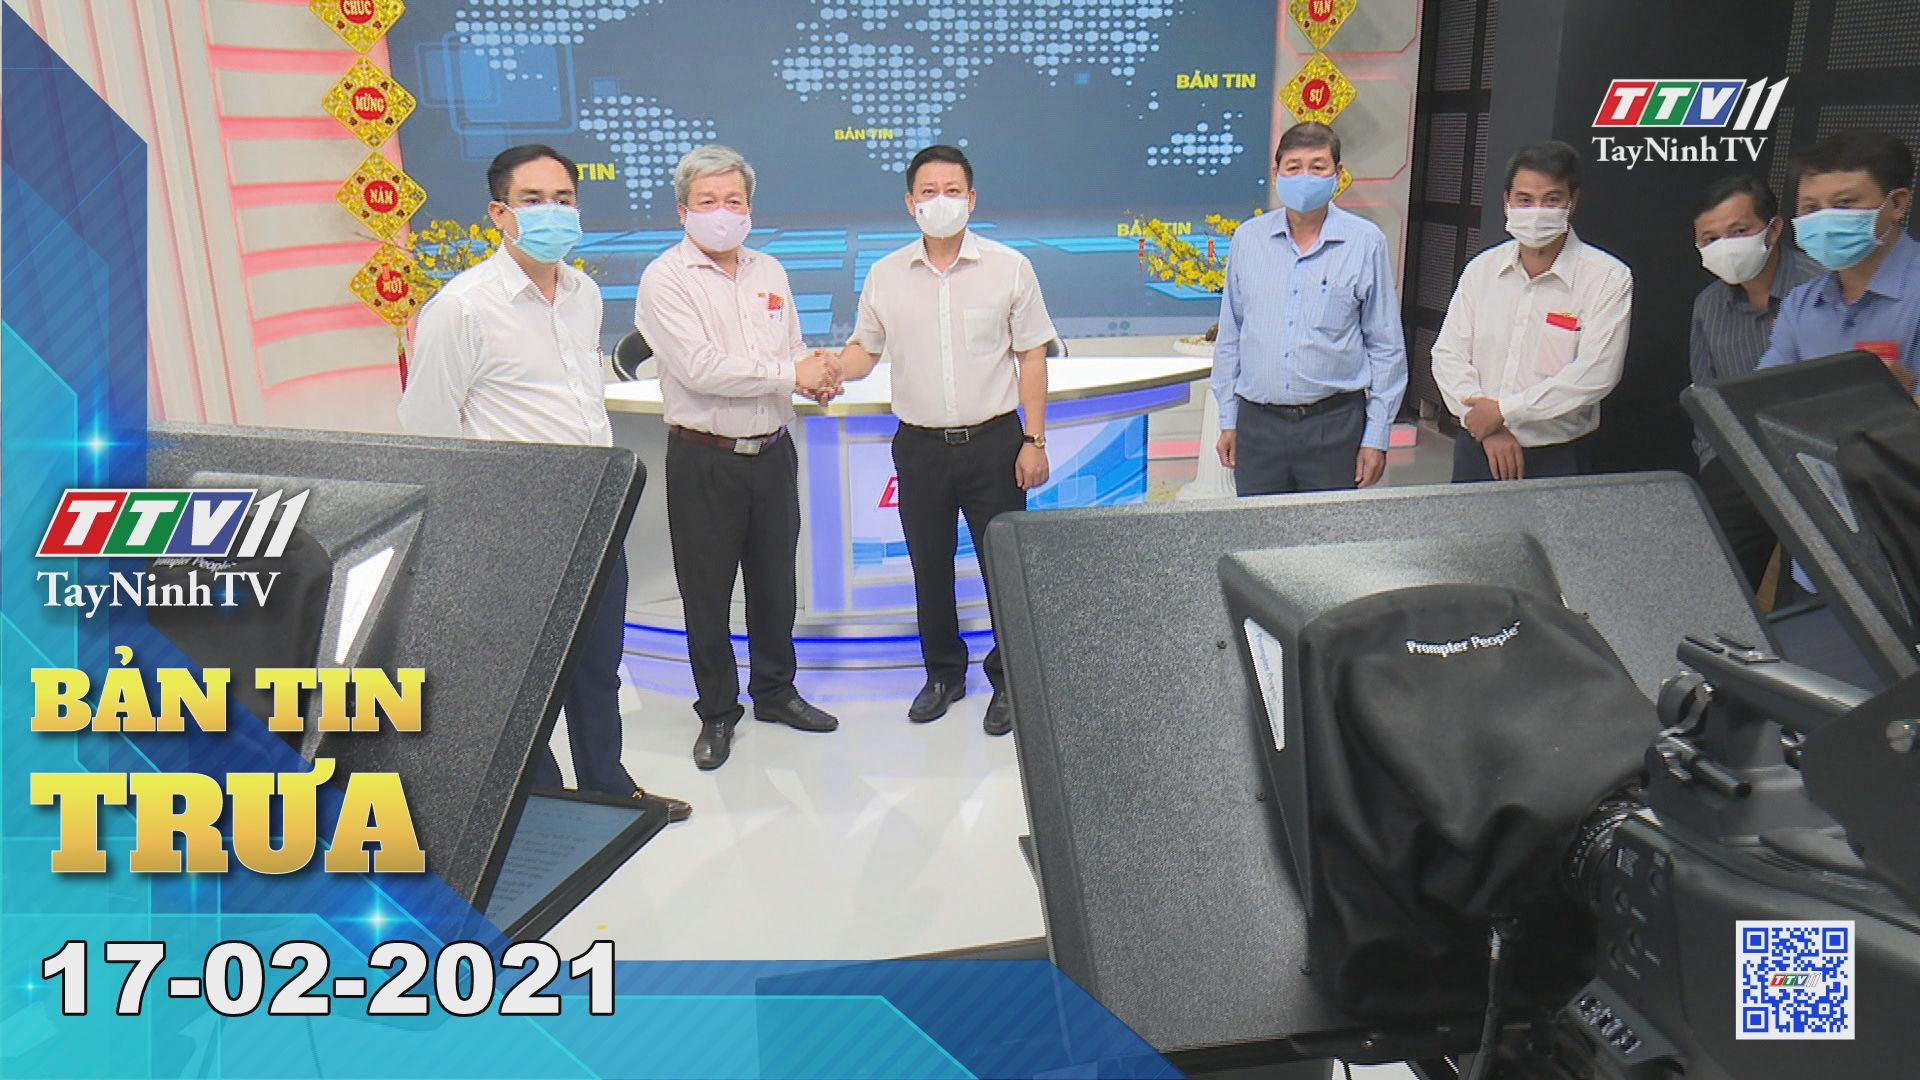 Bản tin trưa 17-02-2021 | Tin tức hôm nay | TayNinhTV